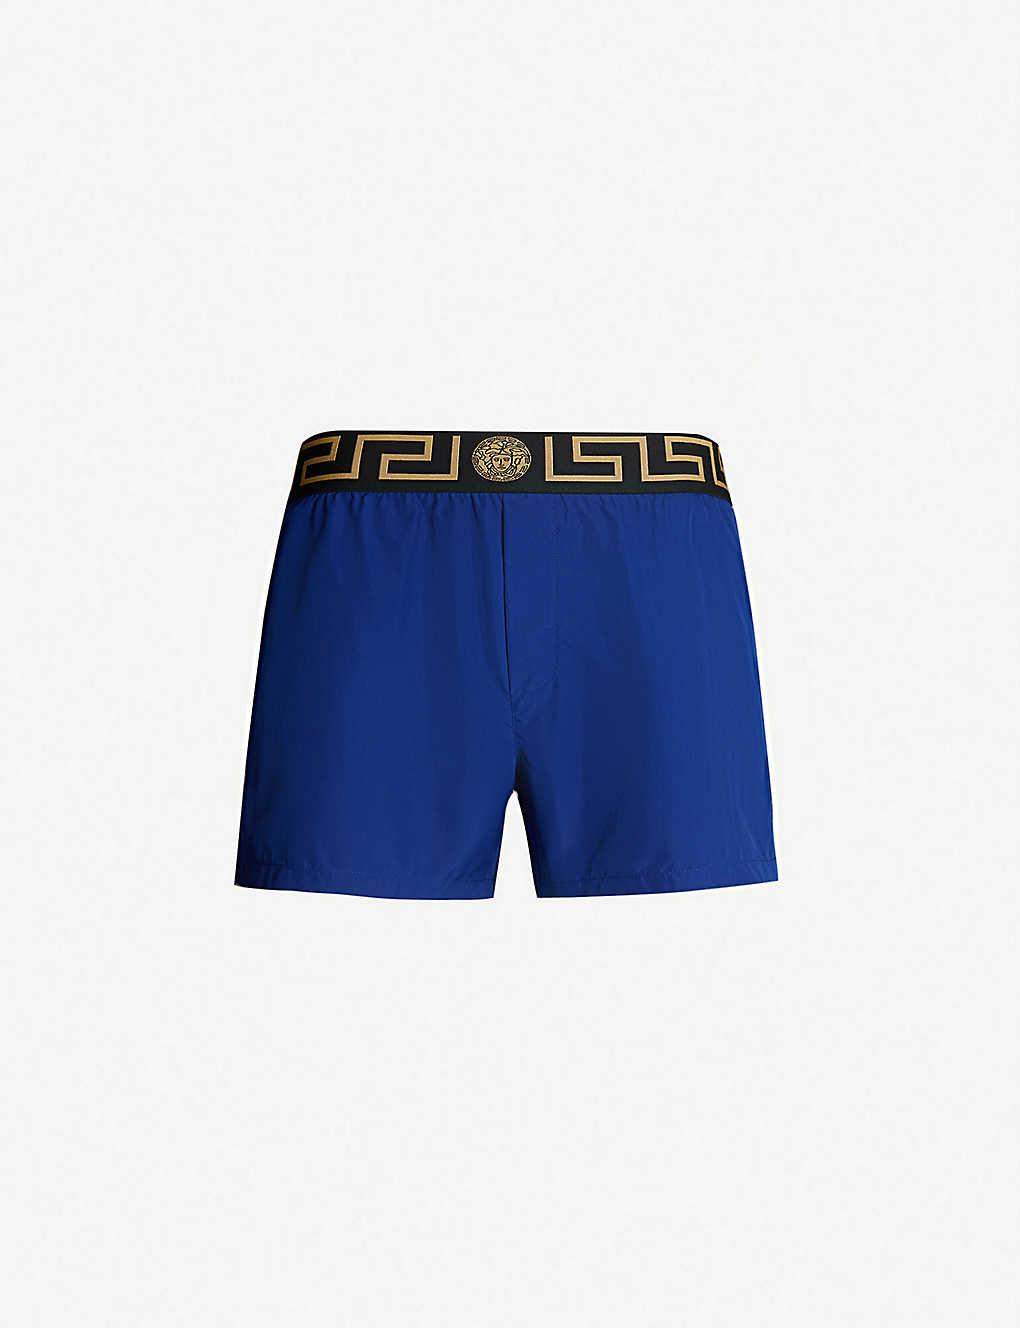 9cfae508d0 VERSACE - Iconic swim shorts | Selfridges.com